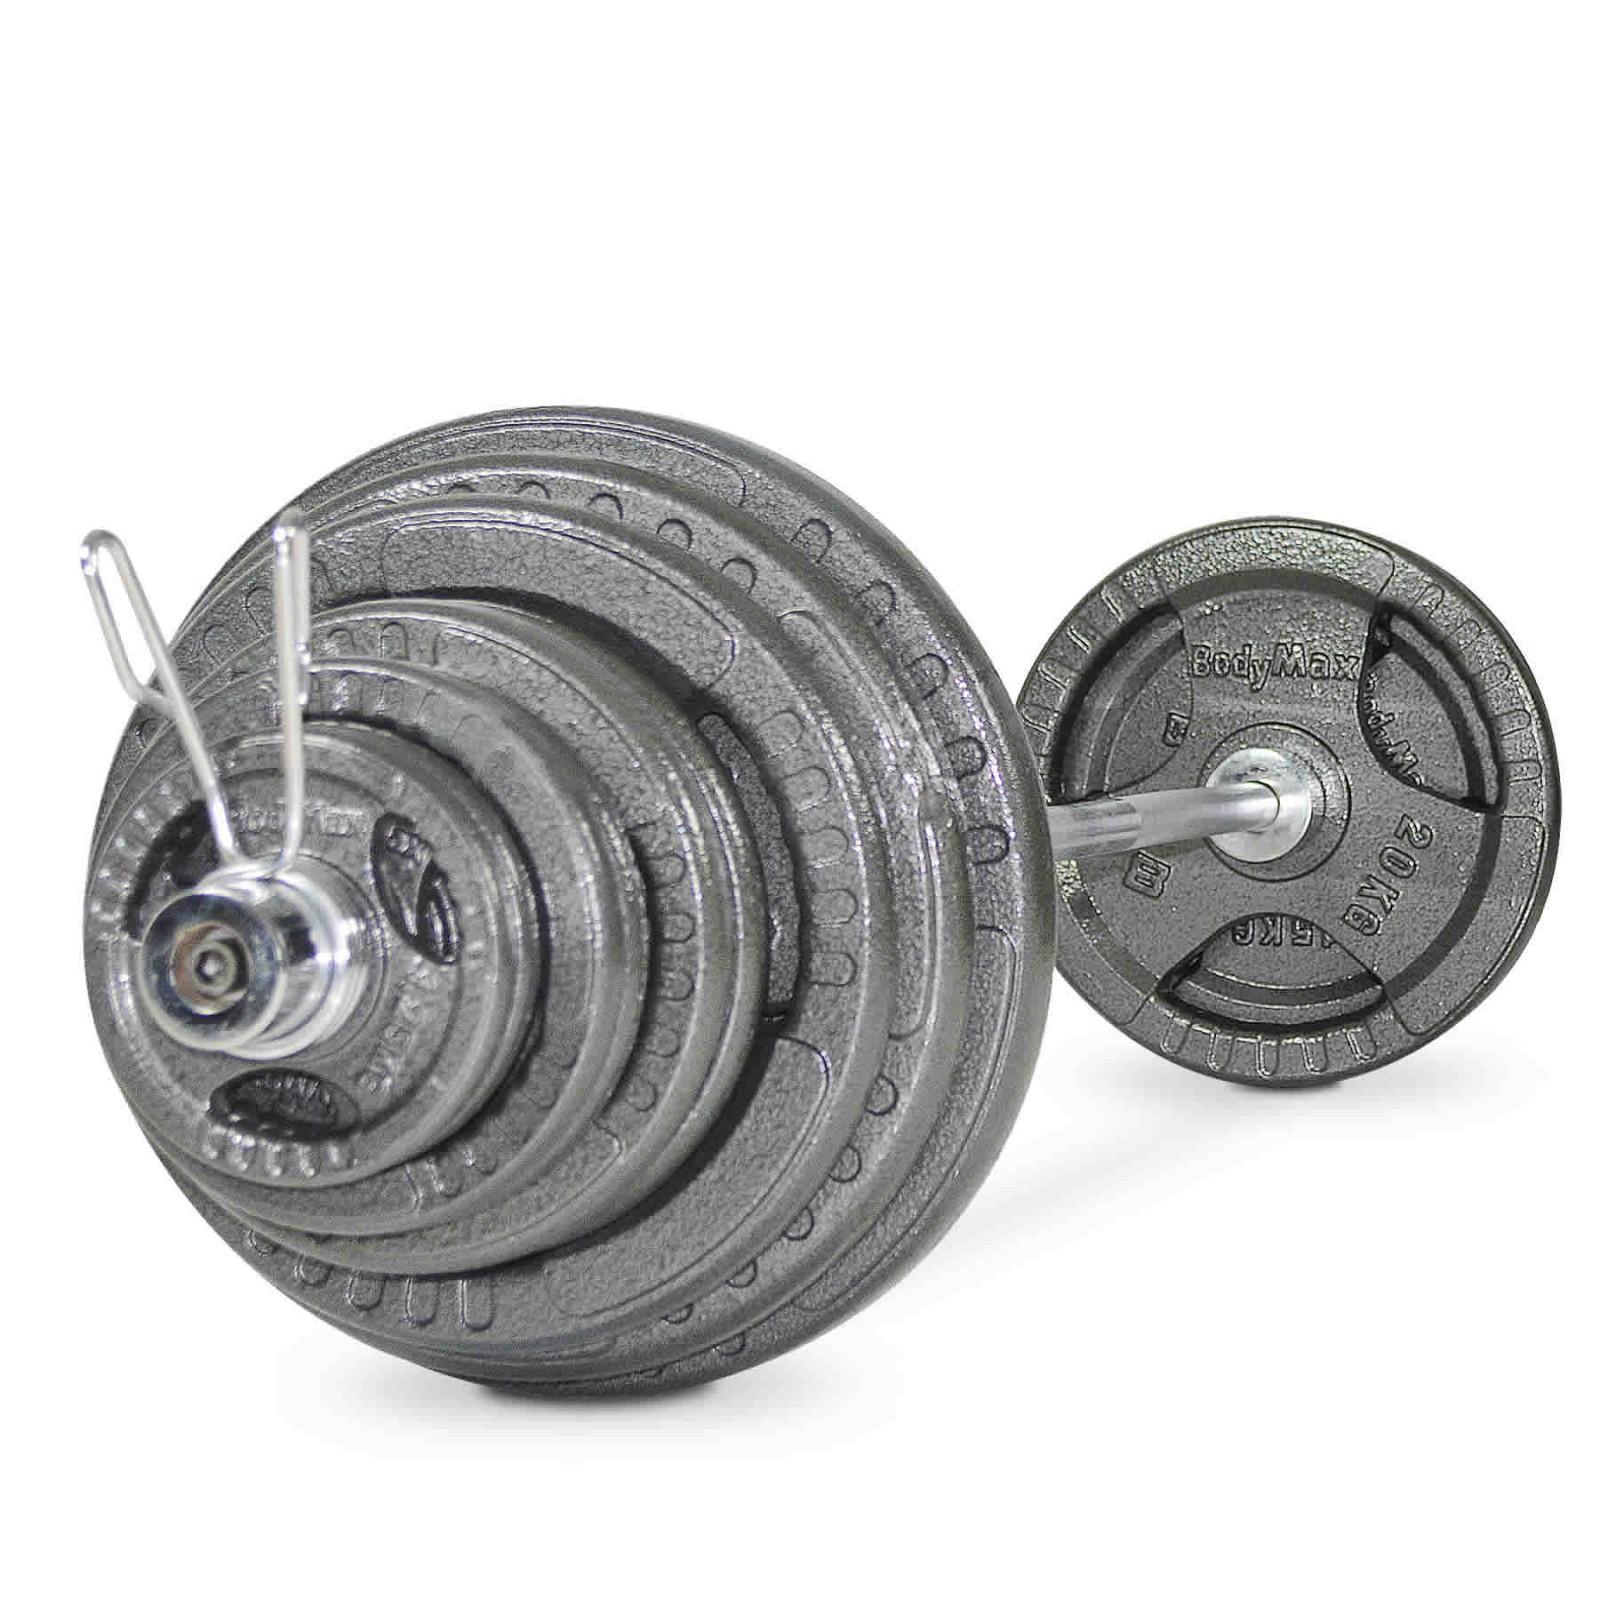 4 x 1.25Kg Bodymax Olympic Cast Iron Tri-Grip Weight Disc Plates